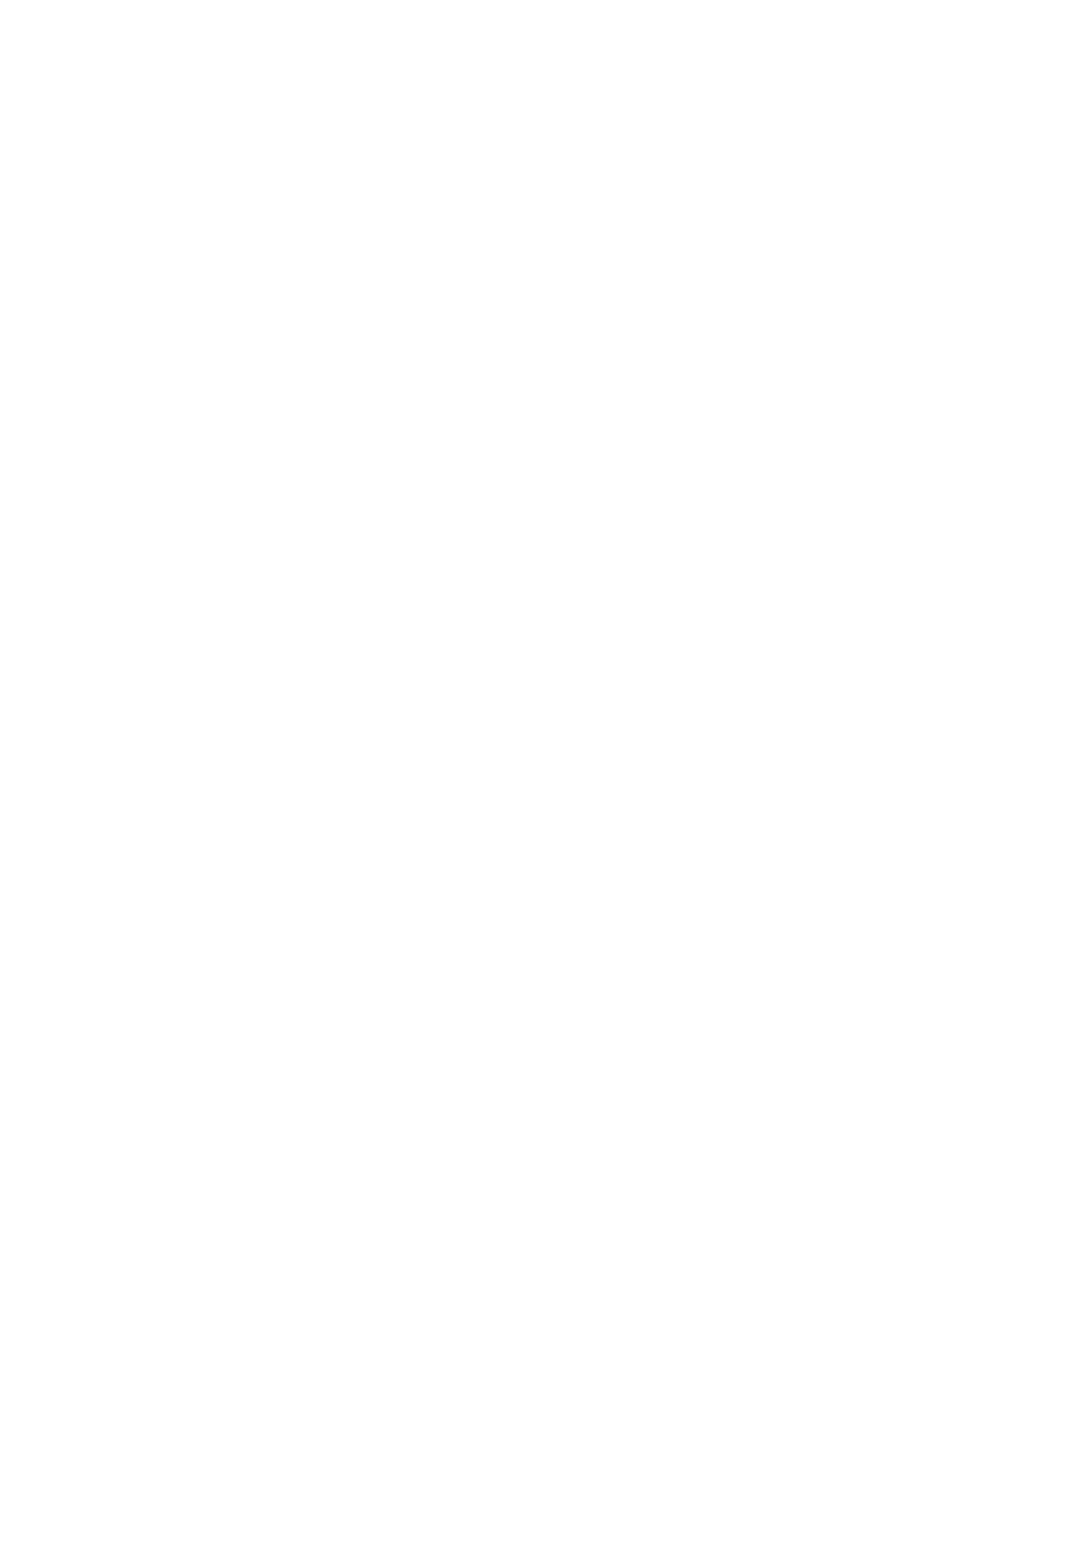 HIA logo with member number